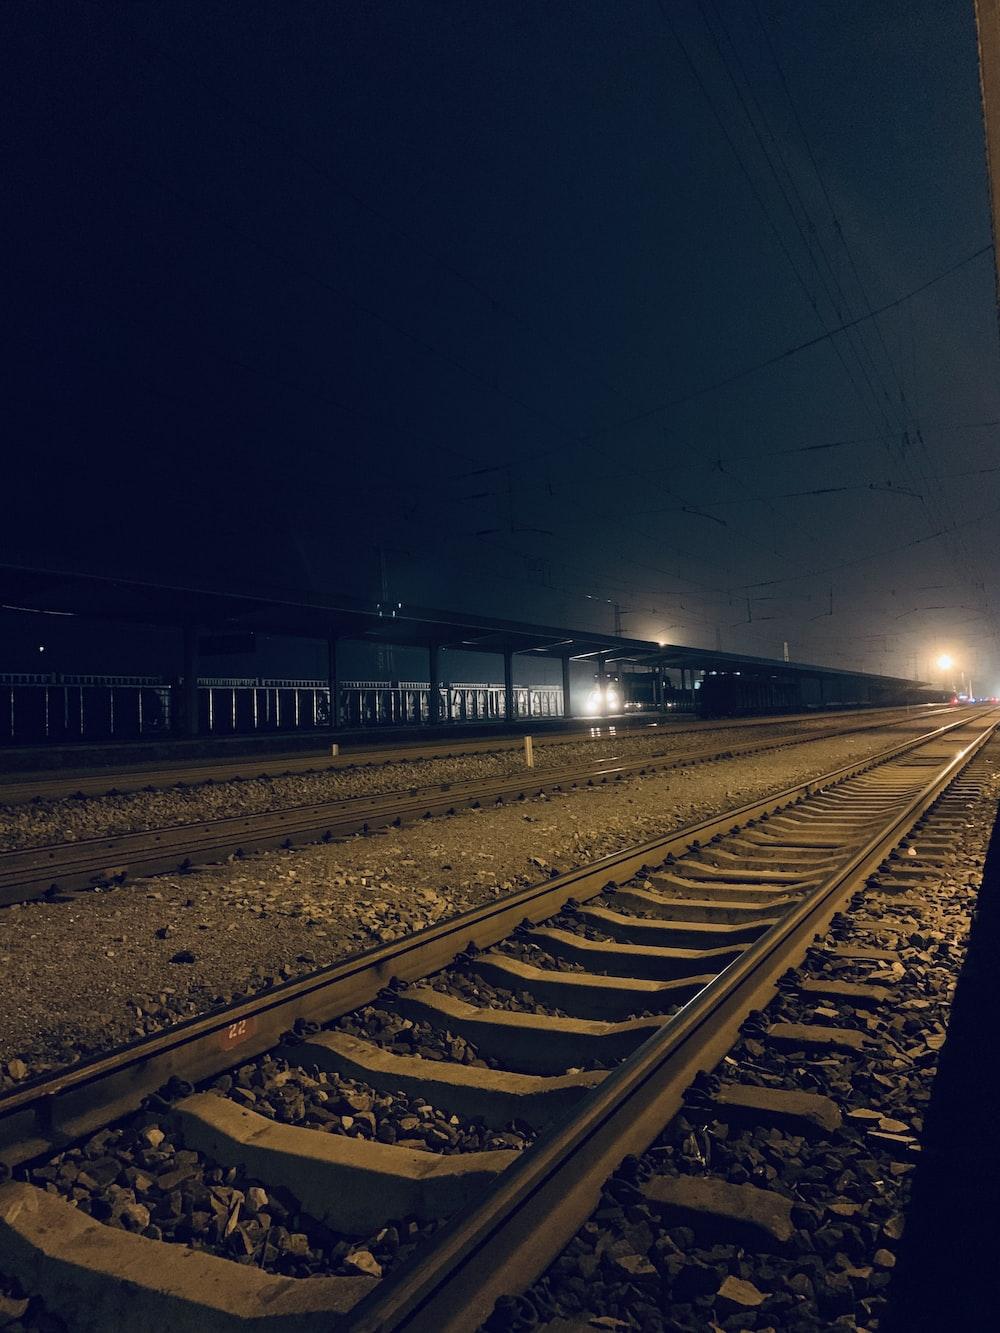 gray train tracks at night